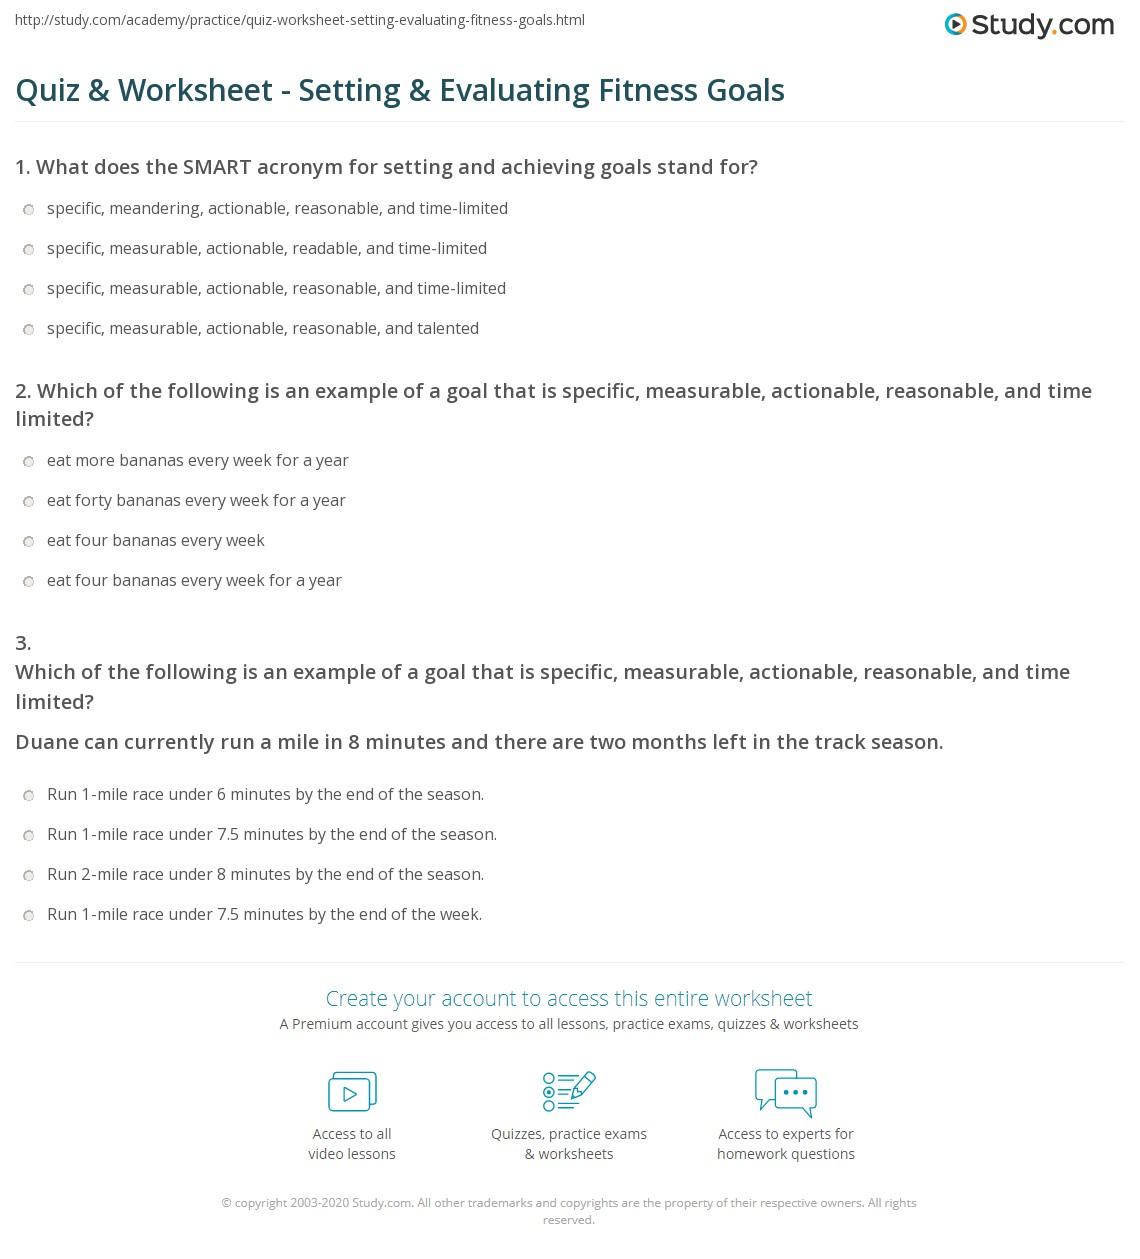 Worksheets Fitness Goals Worksheet quiz worksheet setting evaluating fitness goals study com print how to establish monitor worksheet